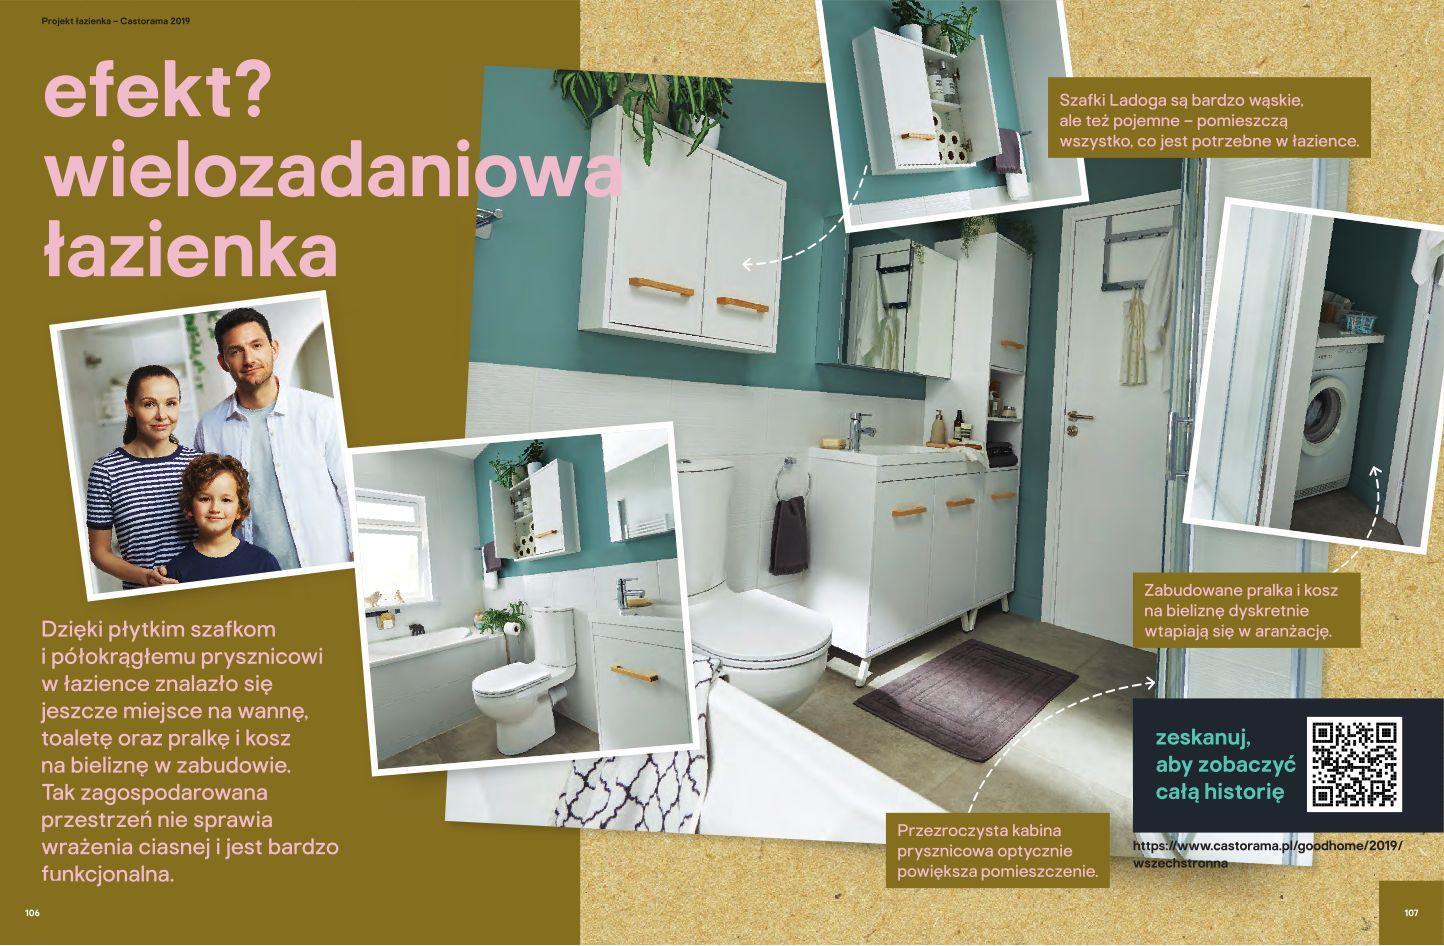 Gazetka promocyjna Castorama do 31/12/2019 str.54